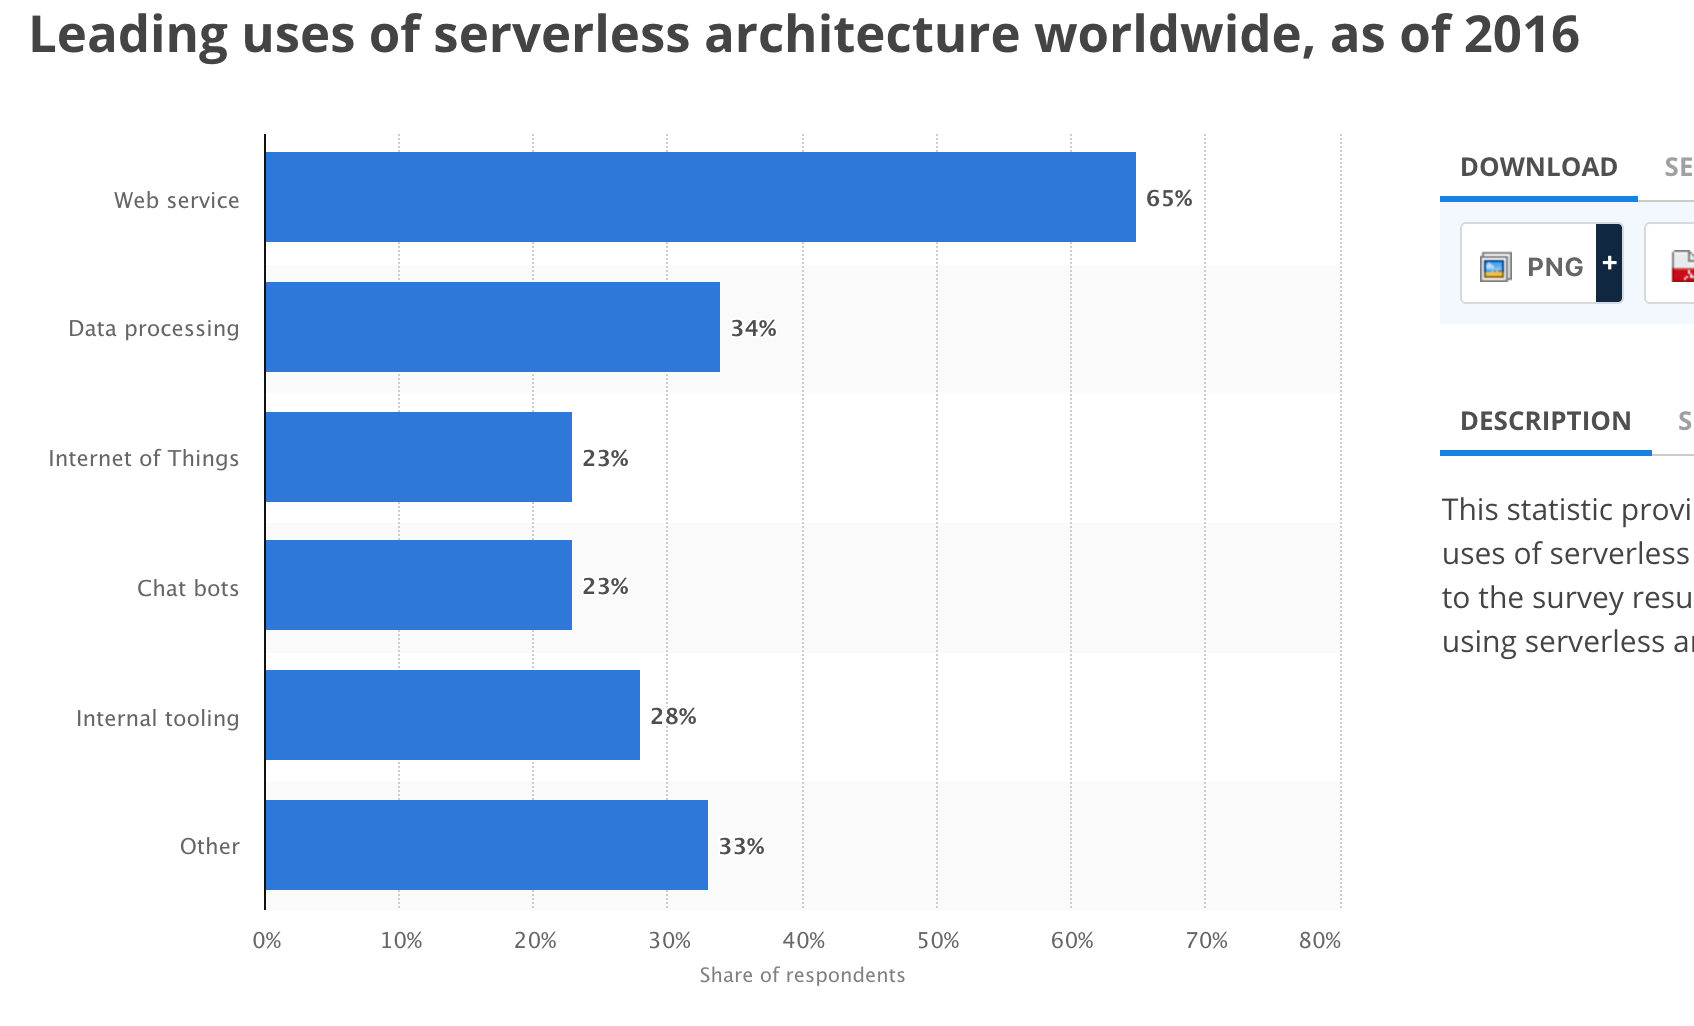 leading uses of serverless architechture